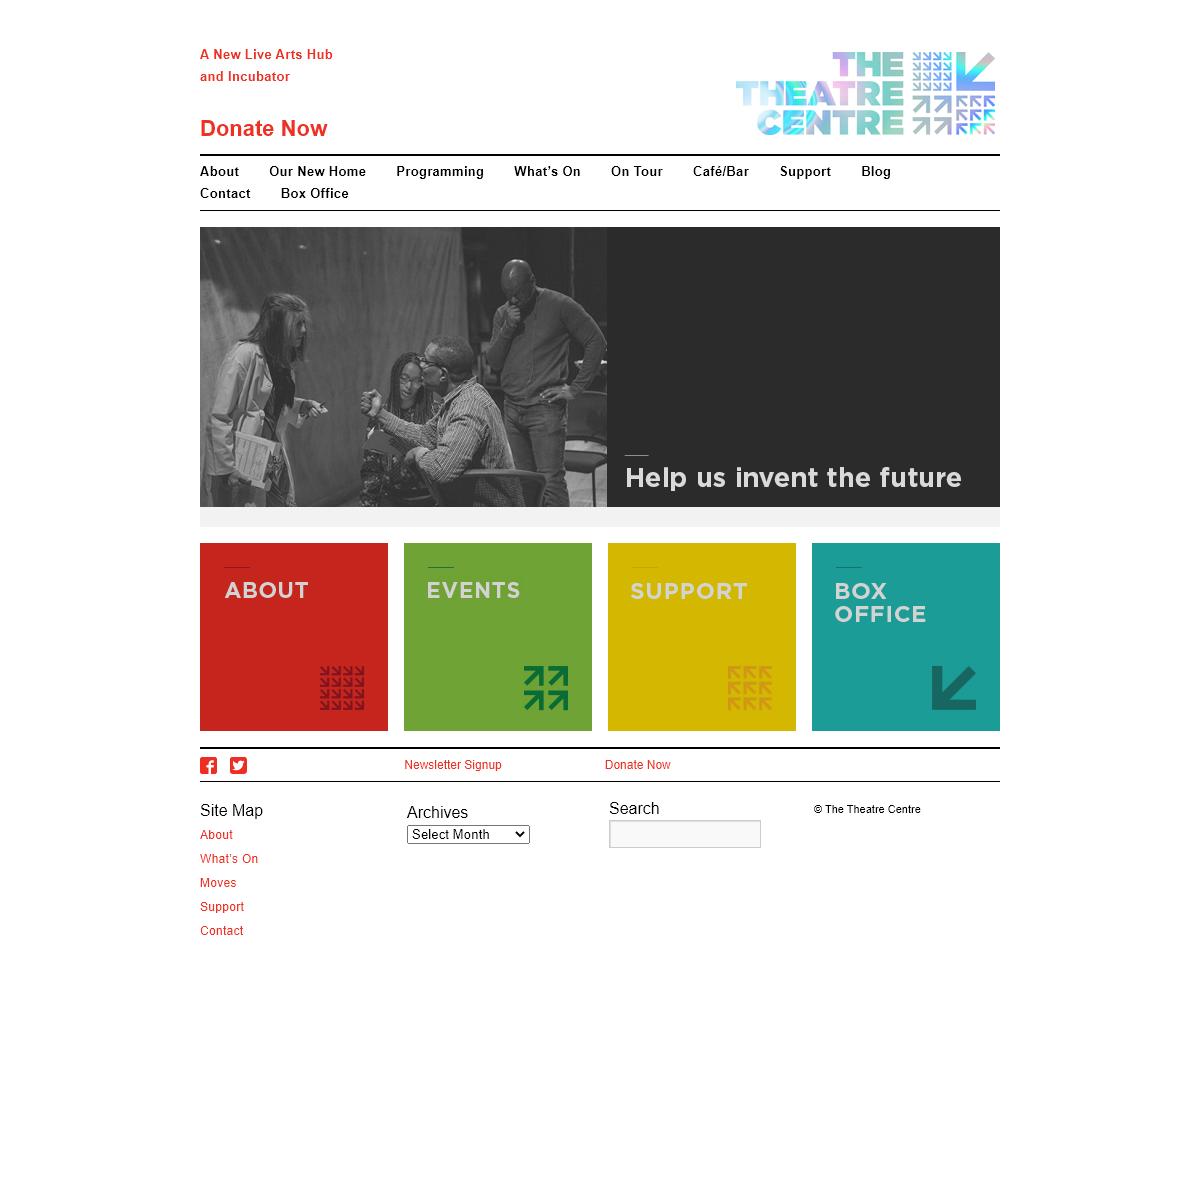 The Theatre Centre - A New Live Arts Hub and Incubator